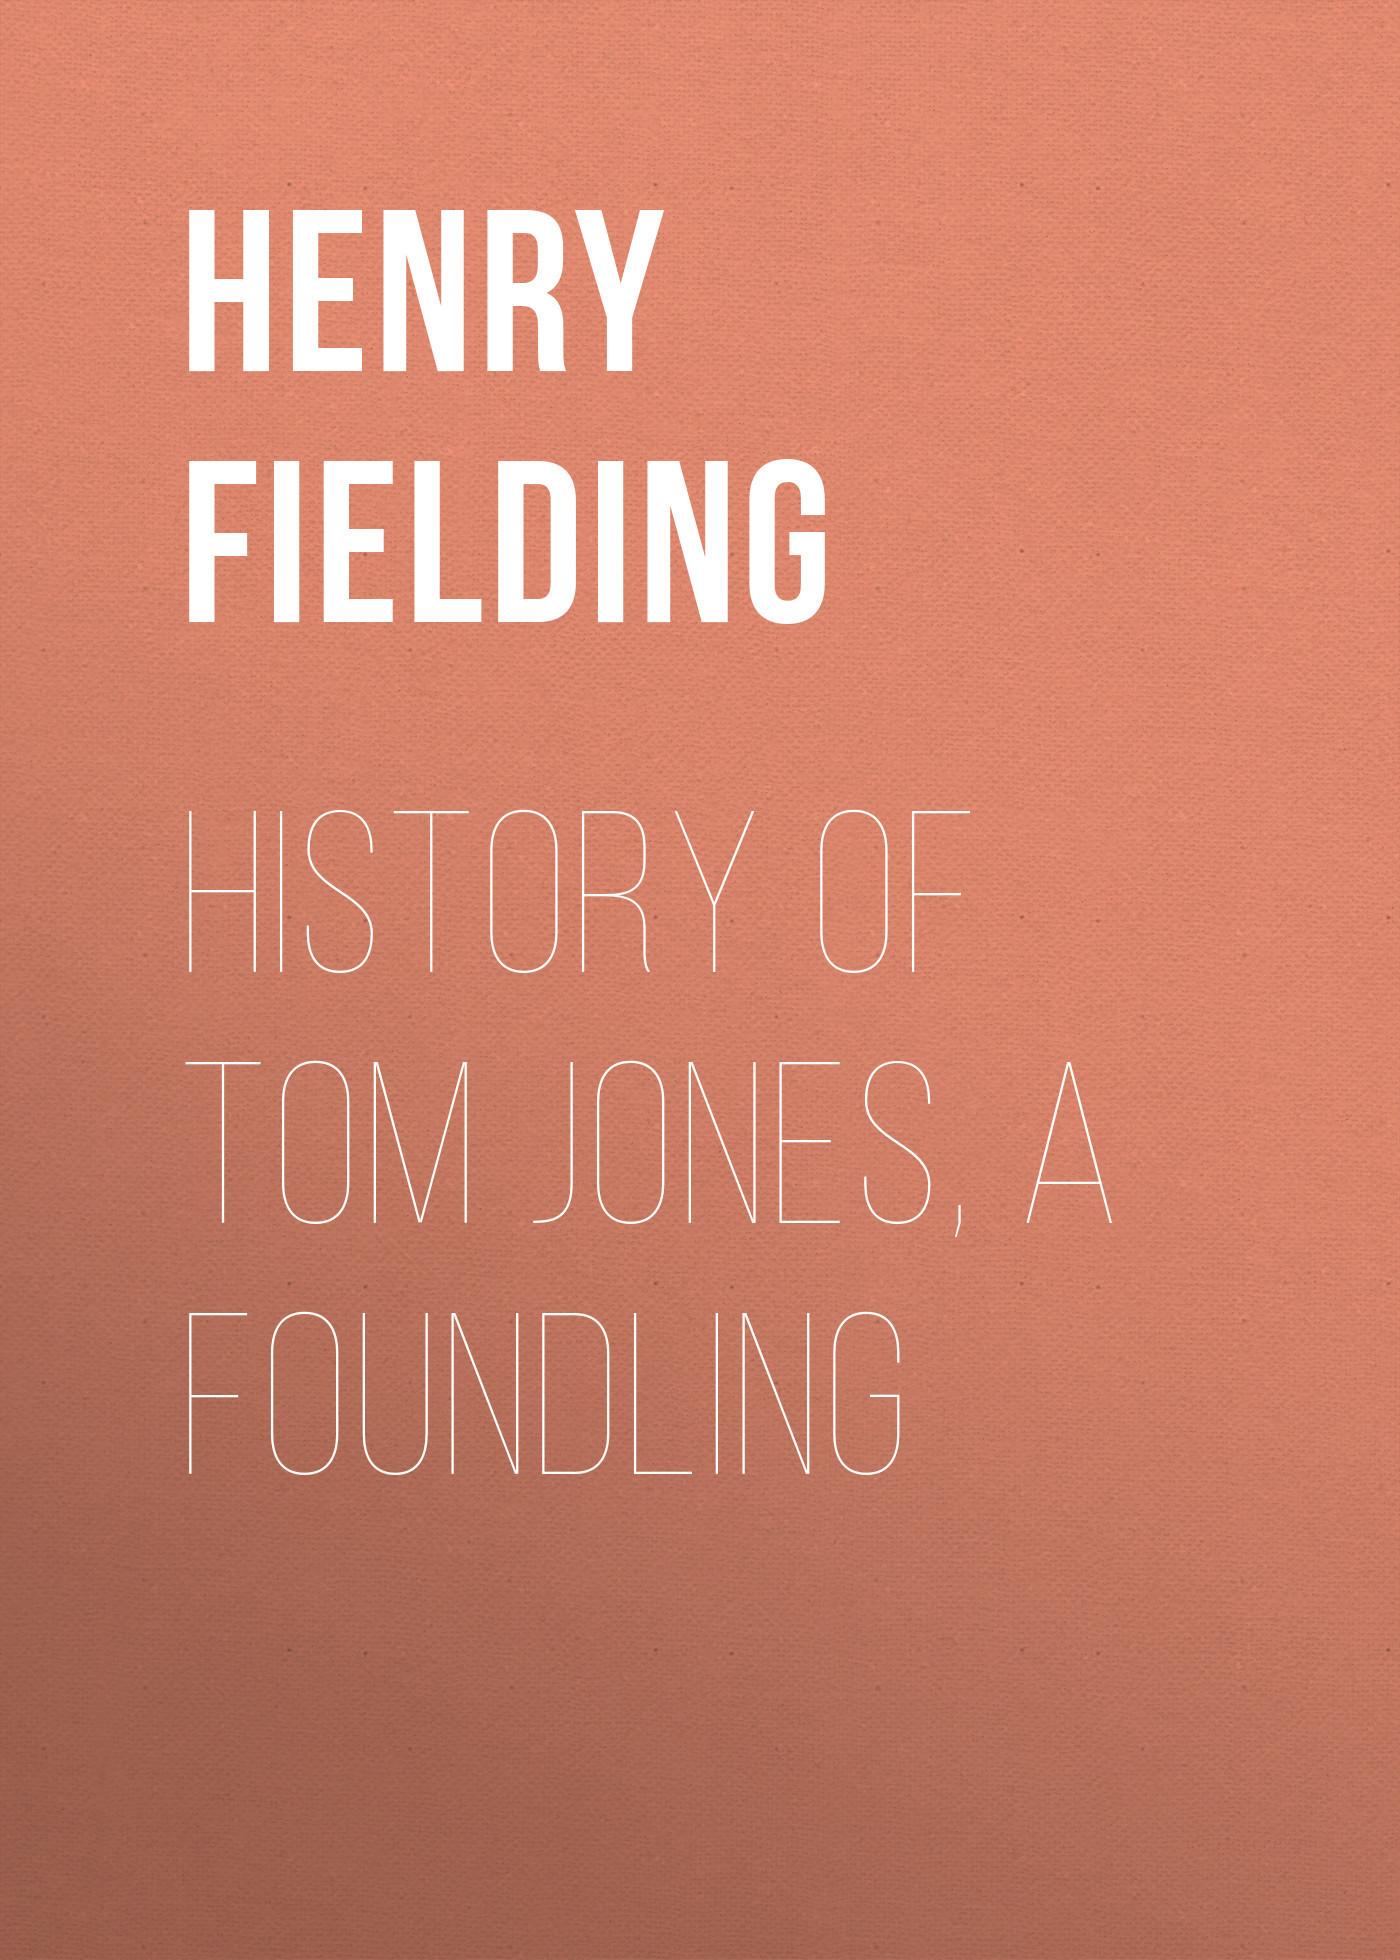 Генри Филдинг History of Tom Jones, a Foundling tom jones bonn